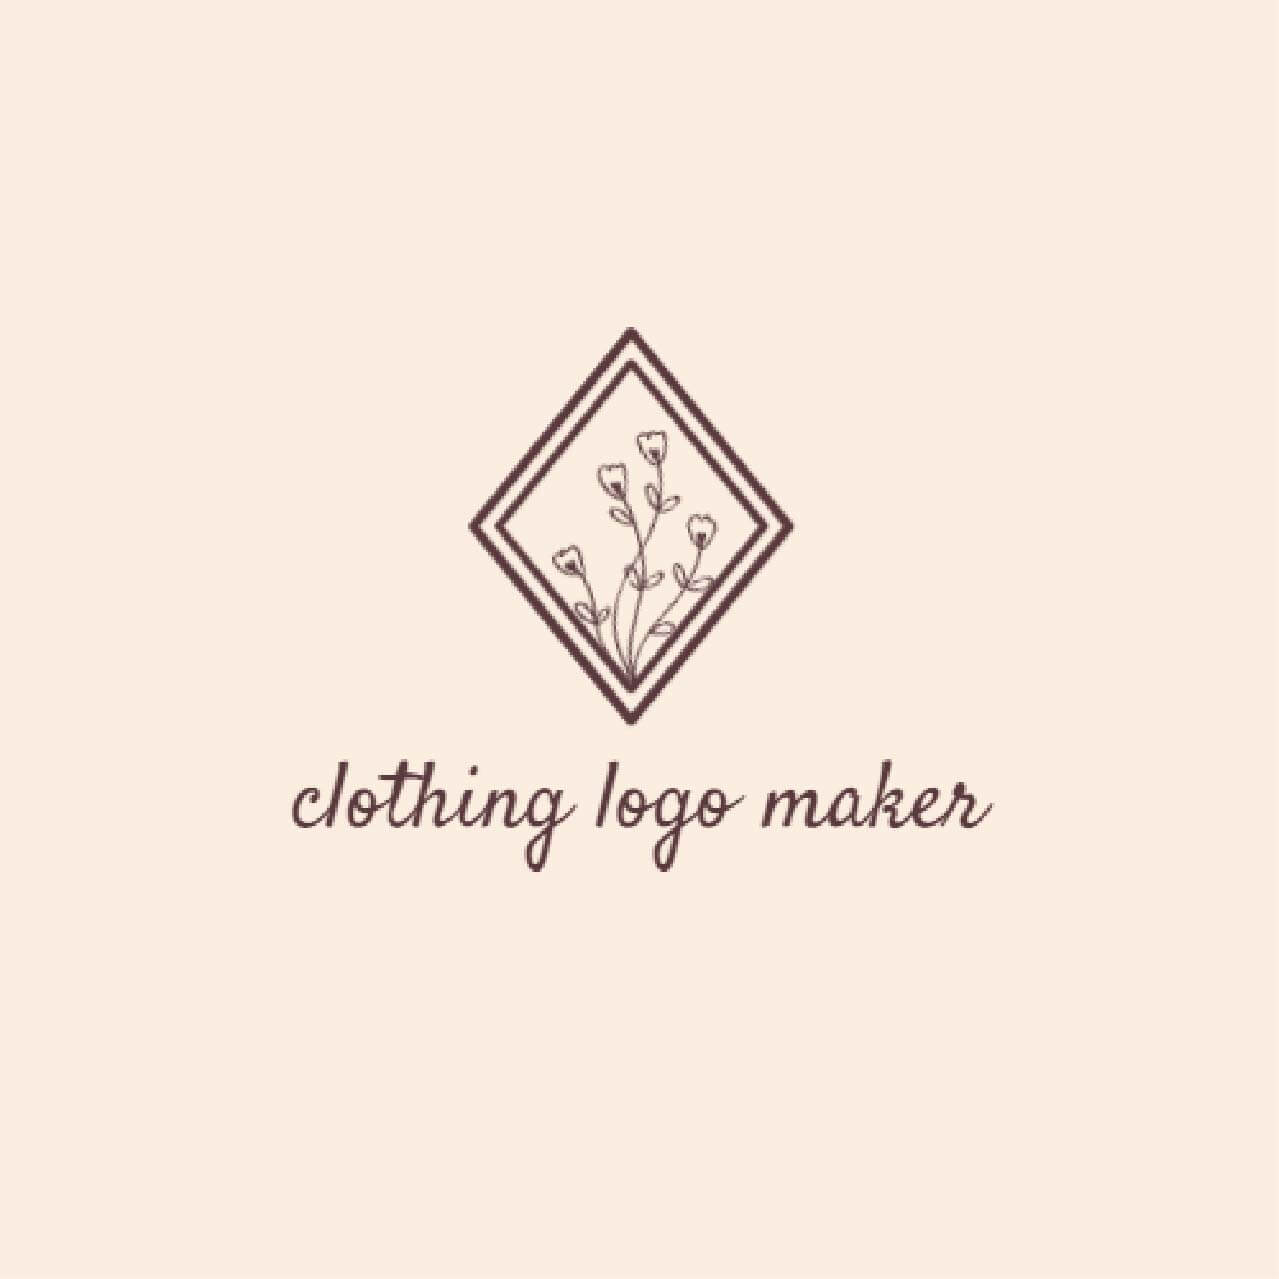 clothing logo maker